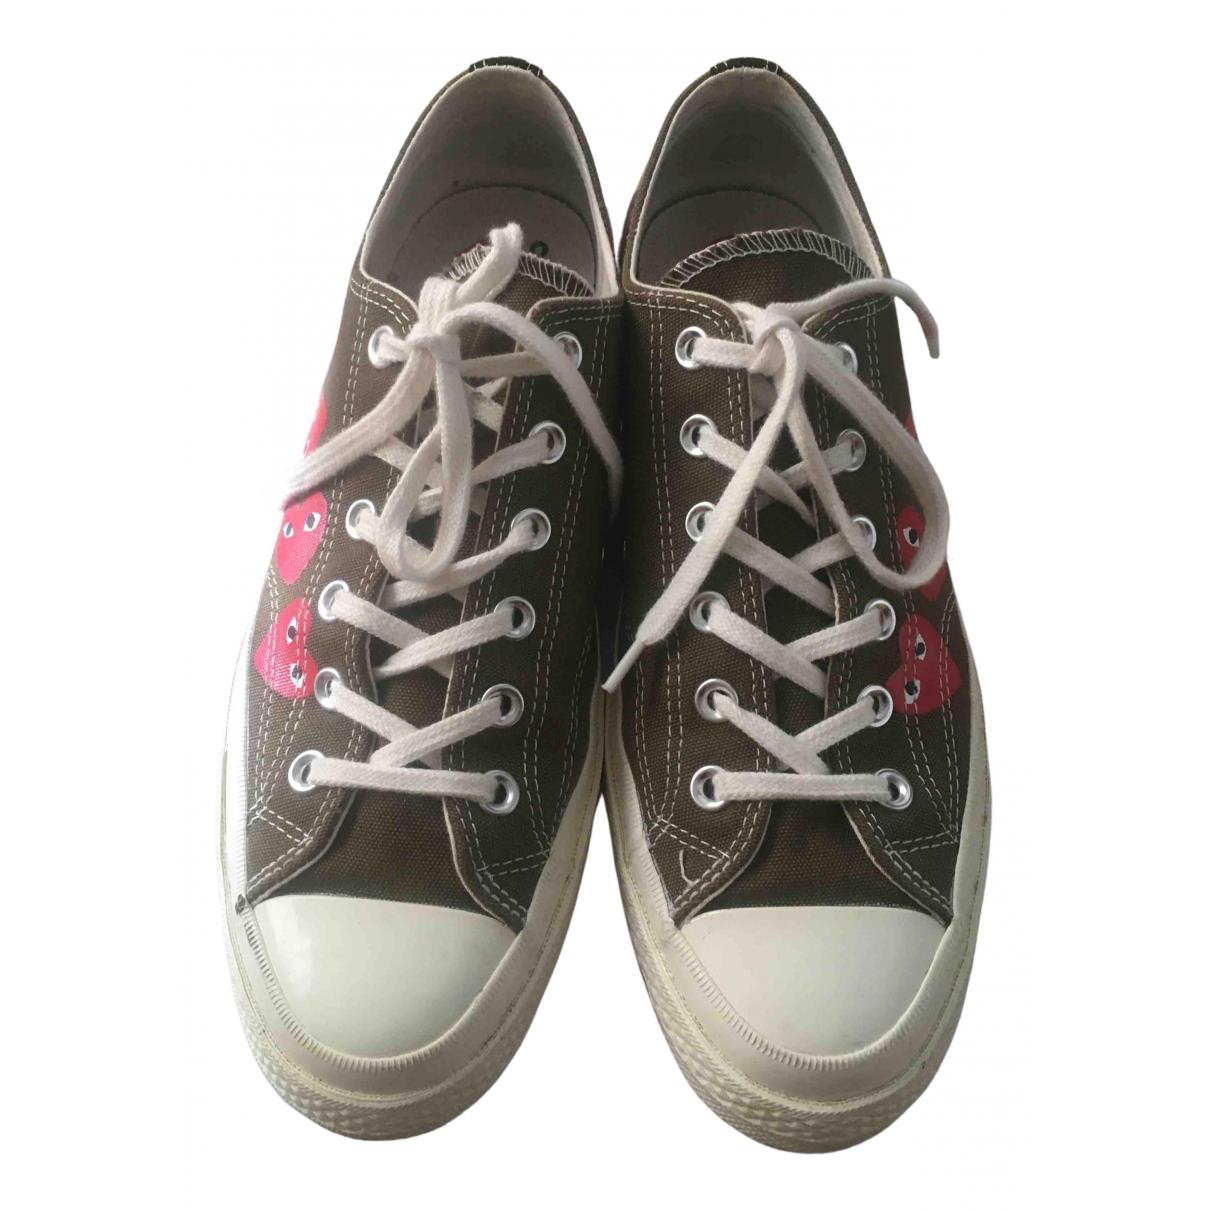 Converse X Play Comme Des Garcons \N Sneakers in  Gruen Leinen